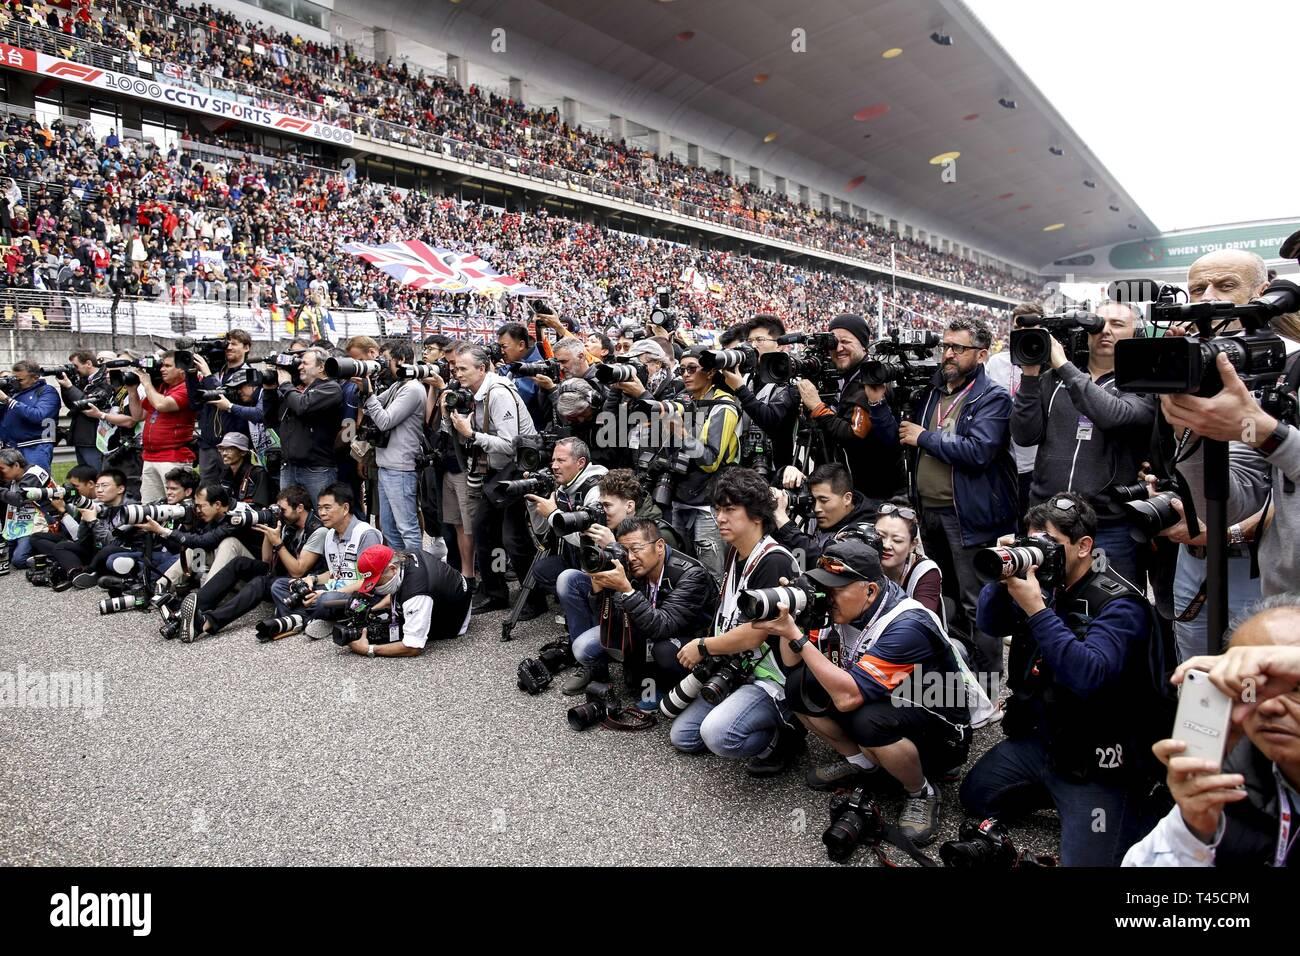 Shanghai, China. 14th Apr, 2019. Motorsports: FIA Formula One World Championship 2019, Grand Prix of China, photographer, Fotograf, media, Medien, press, Presse 14.04.2019. | usage worldwide Credit: dpa/Alamy Live News Stock Photo